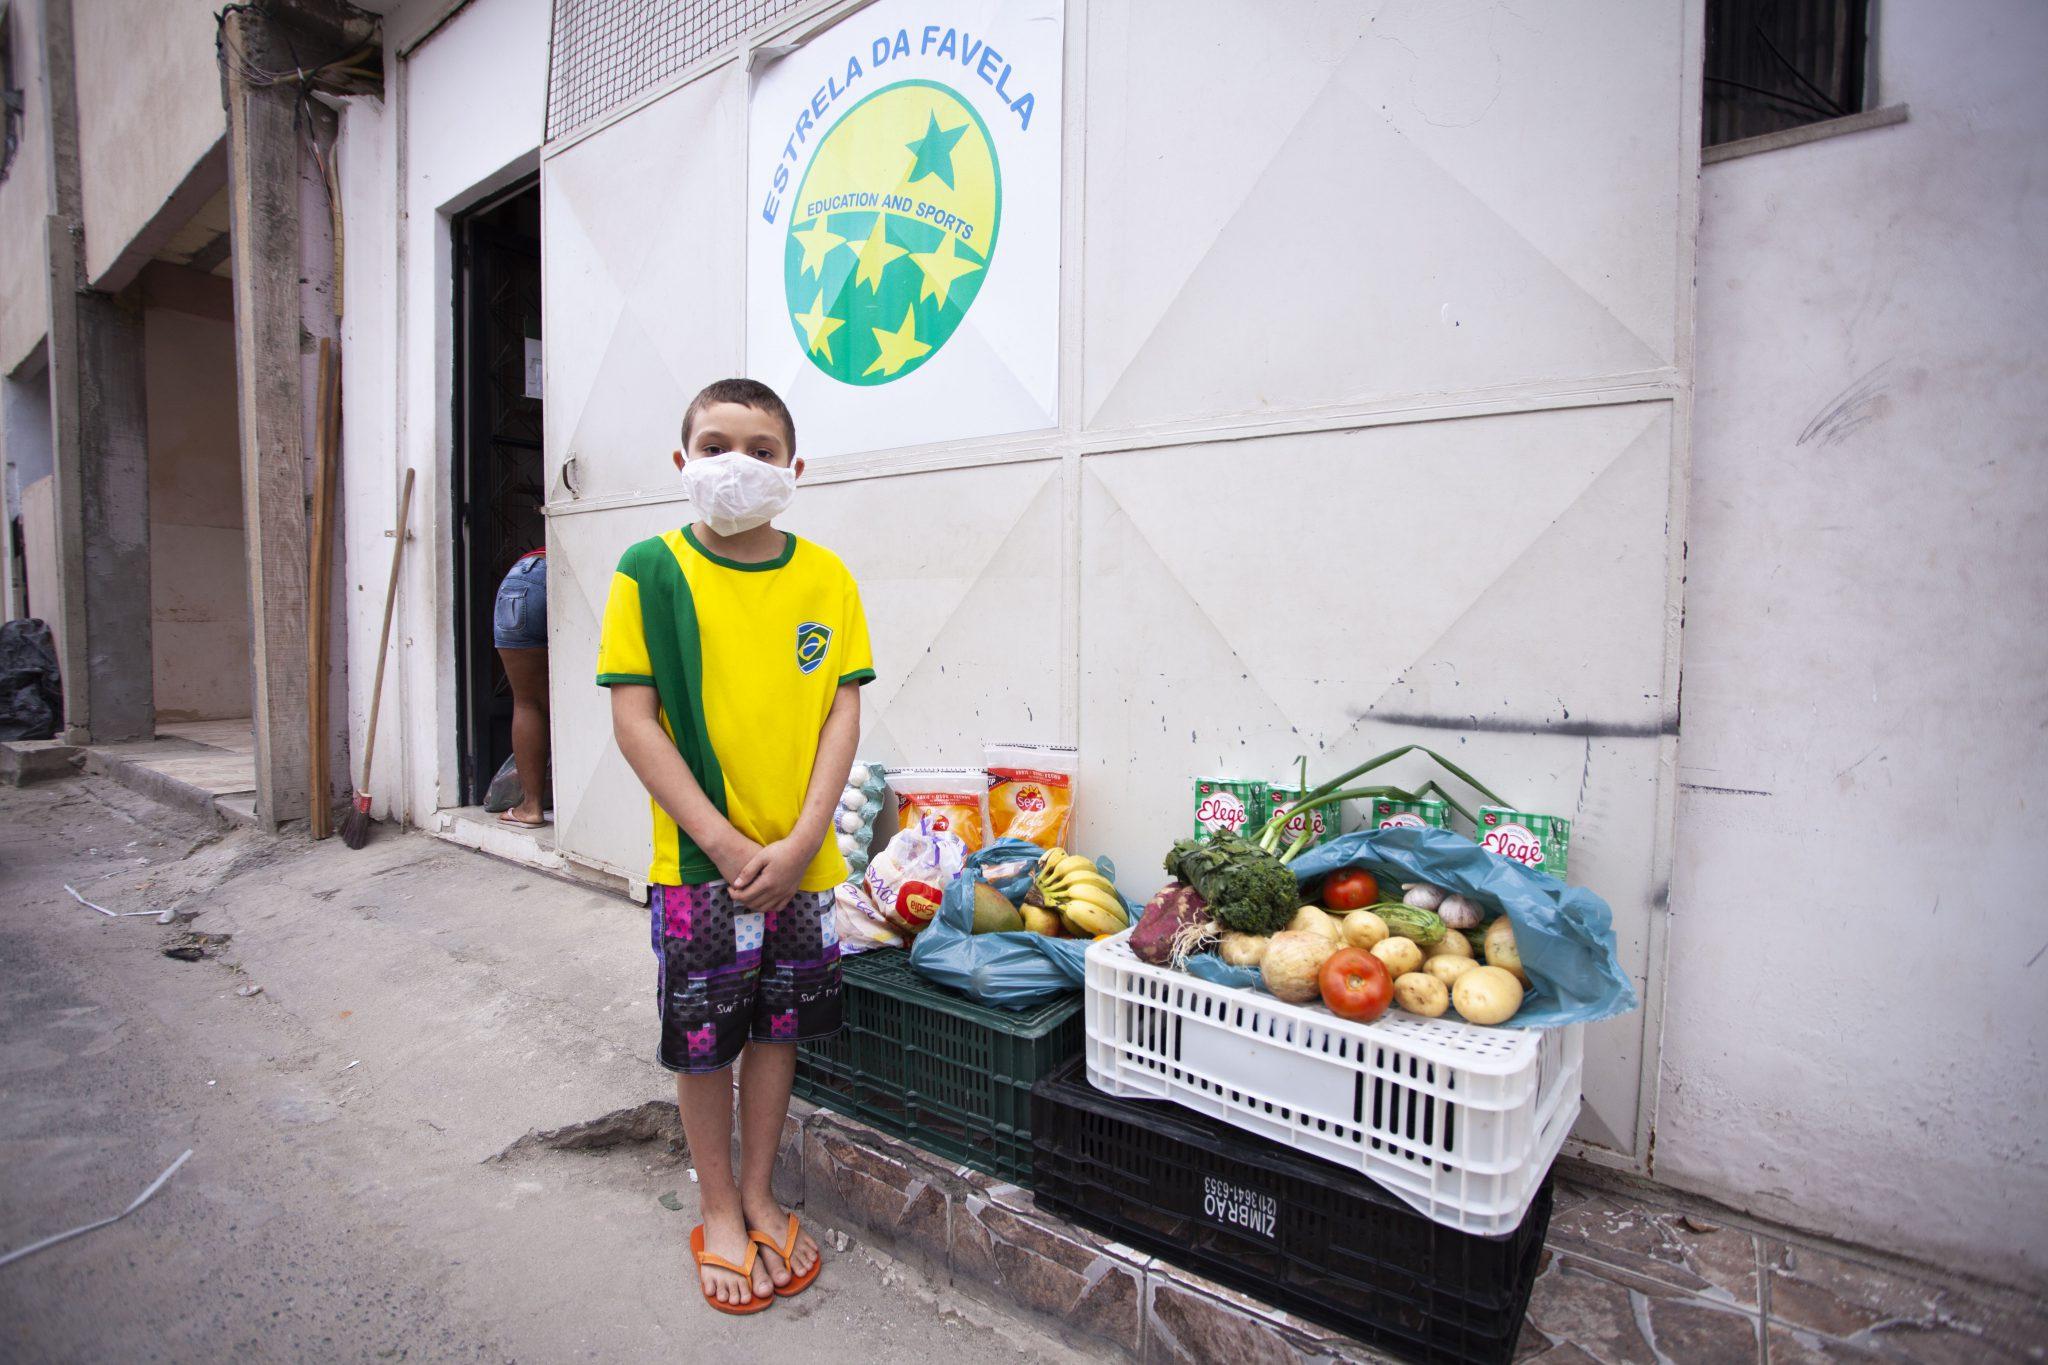 Voedselpakket Estrela da Favela